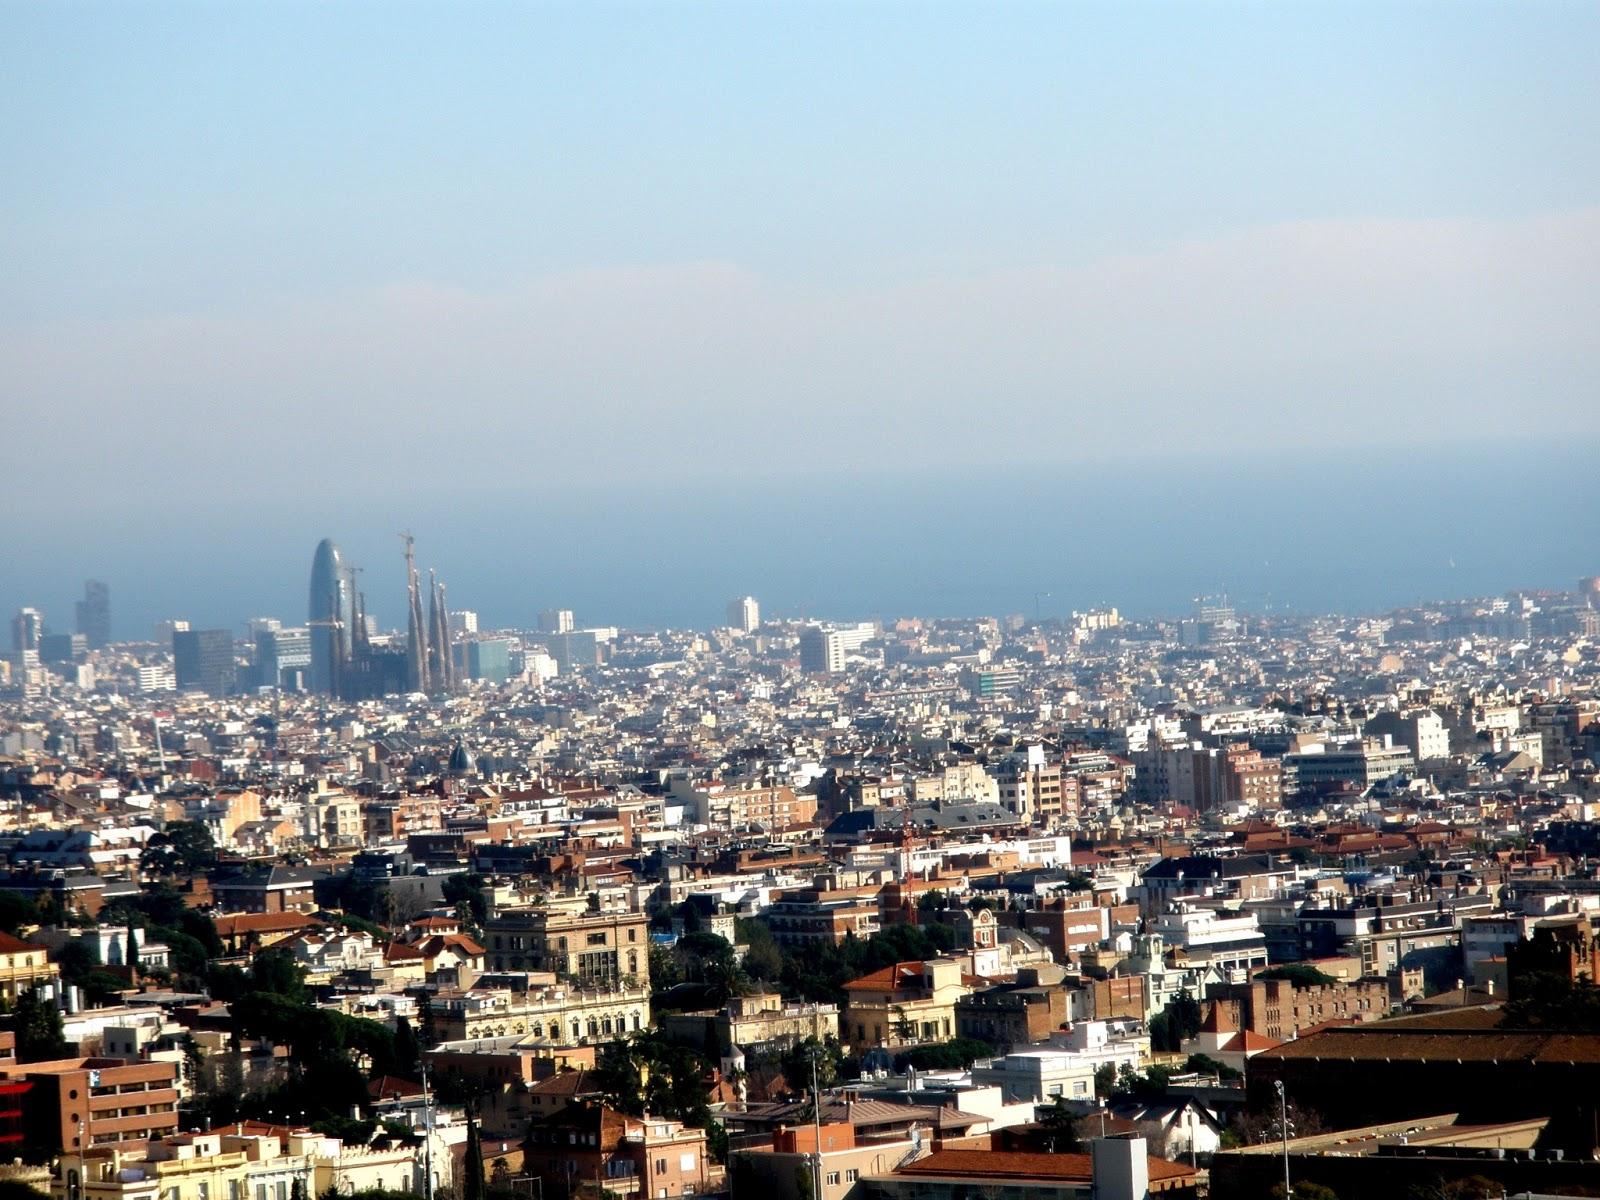 Libro de bitacora abril 2013 - Casa del libro barcelona rambla catalunya ...